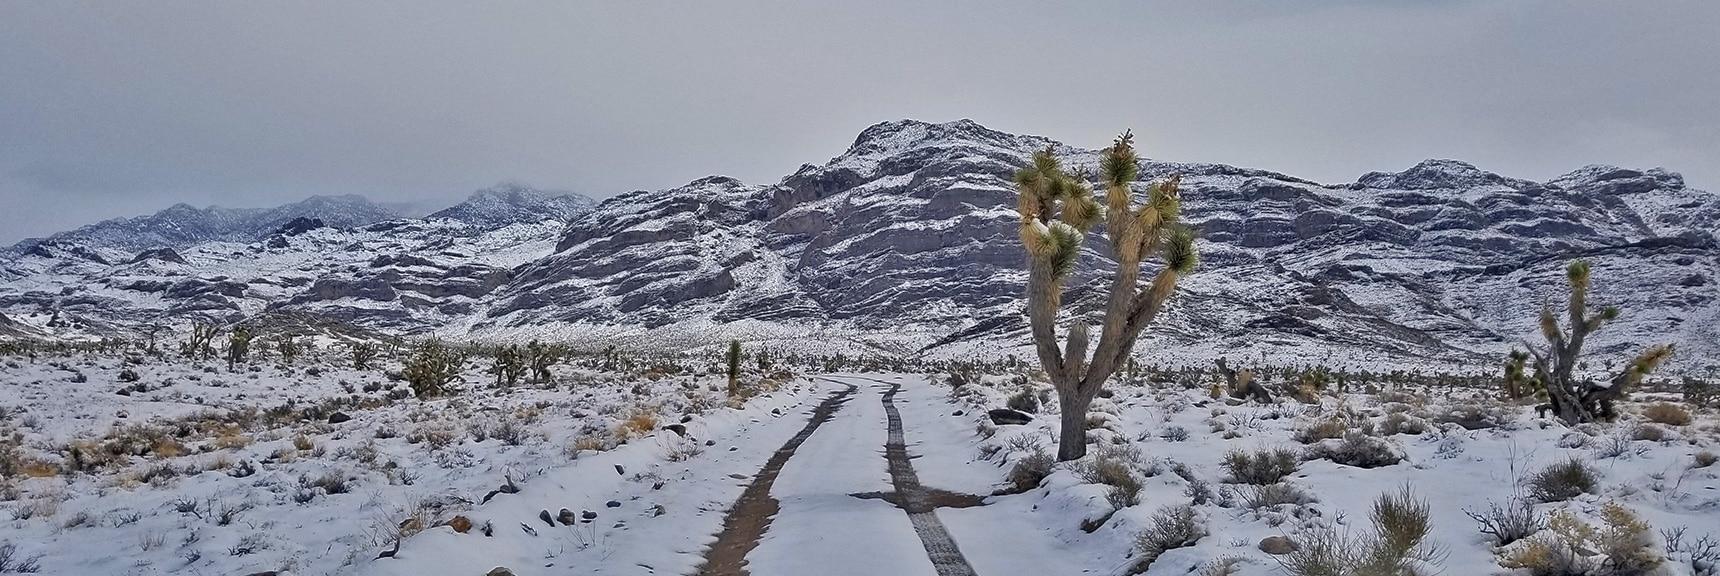 Traveling Upper Cow Camp Road Toward Its End   Cow Camp Road   Sheep Range   Desert National Wildlife Refuge, Nevada